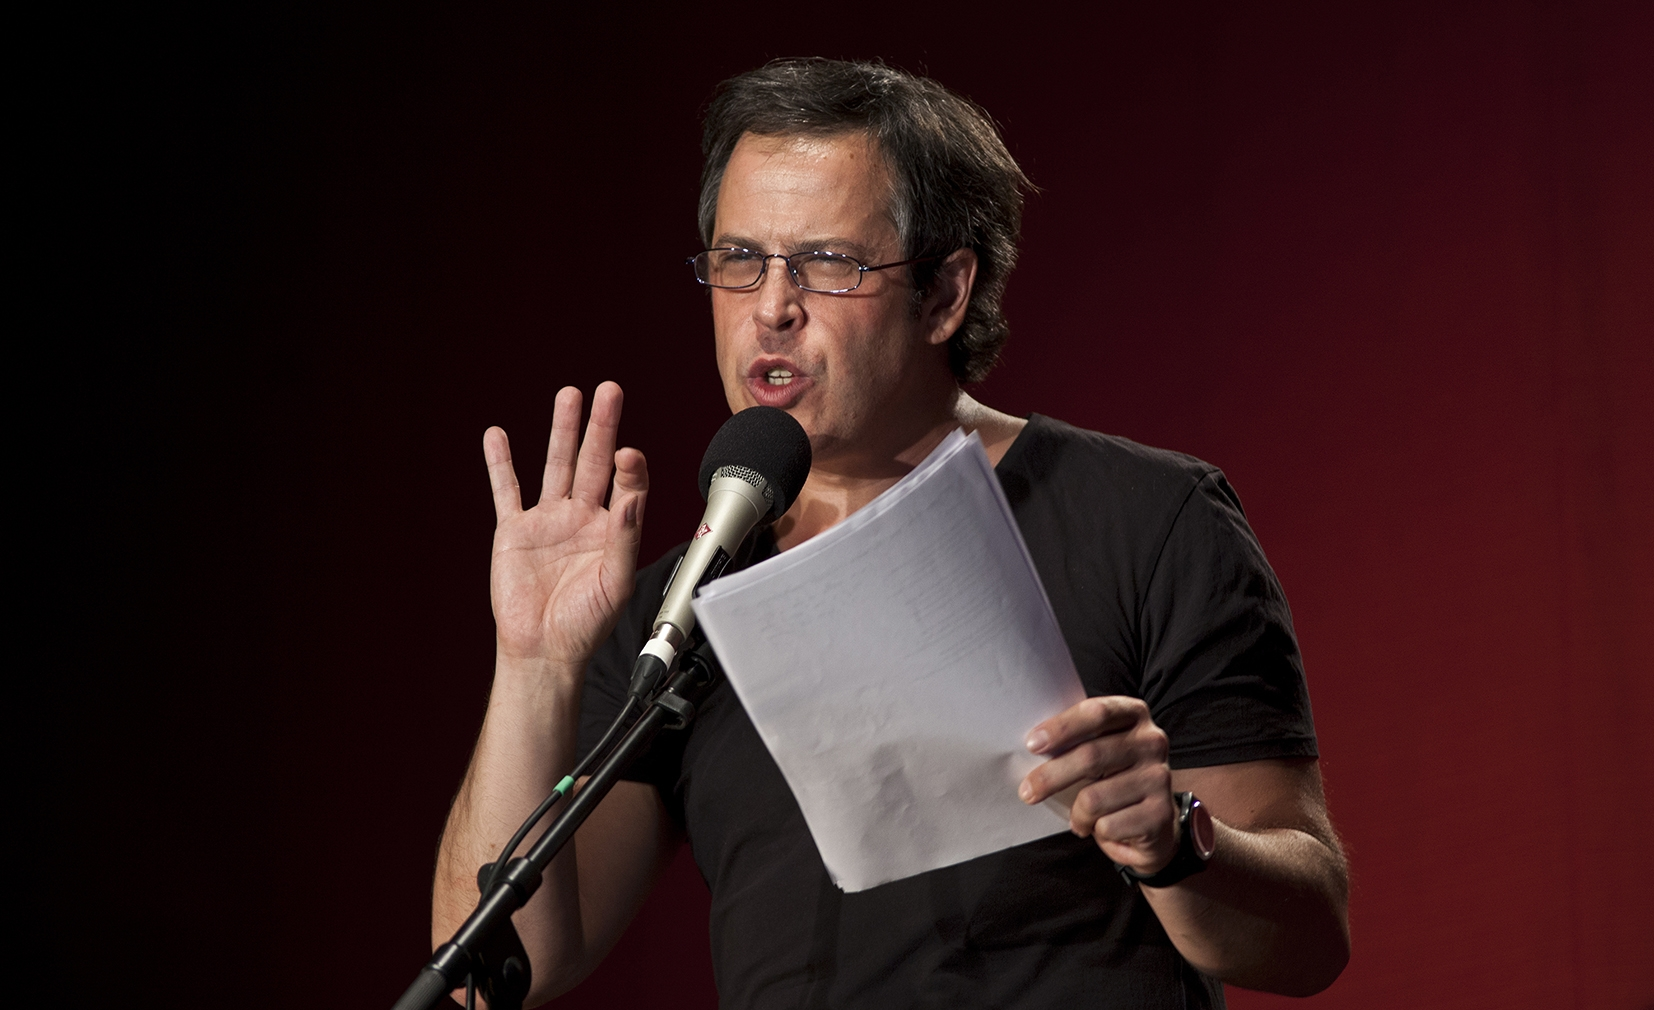 Jean-Luc Despax